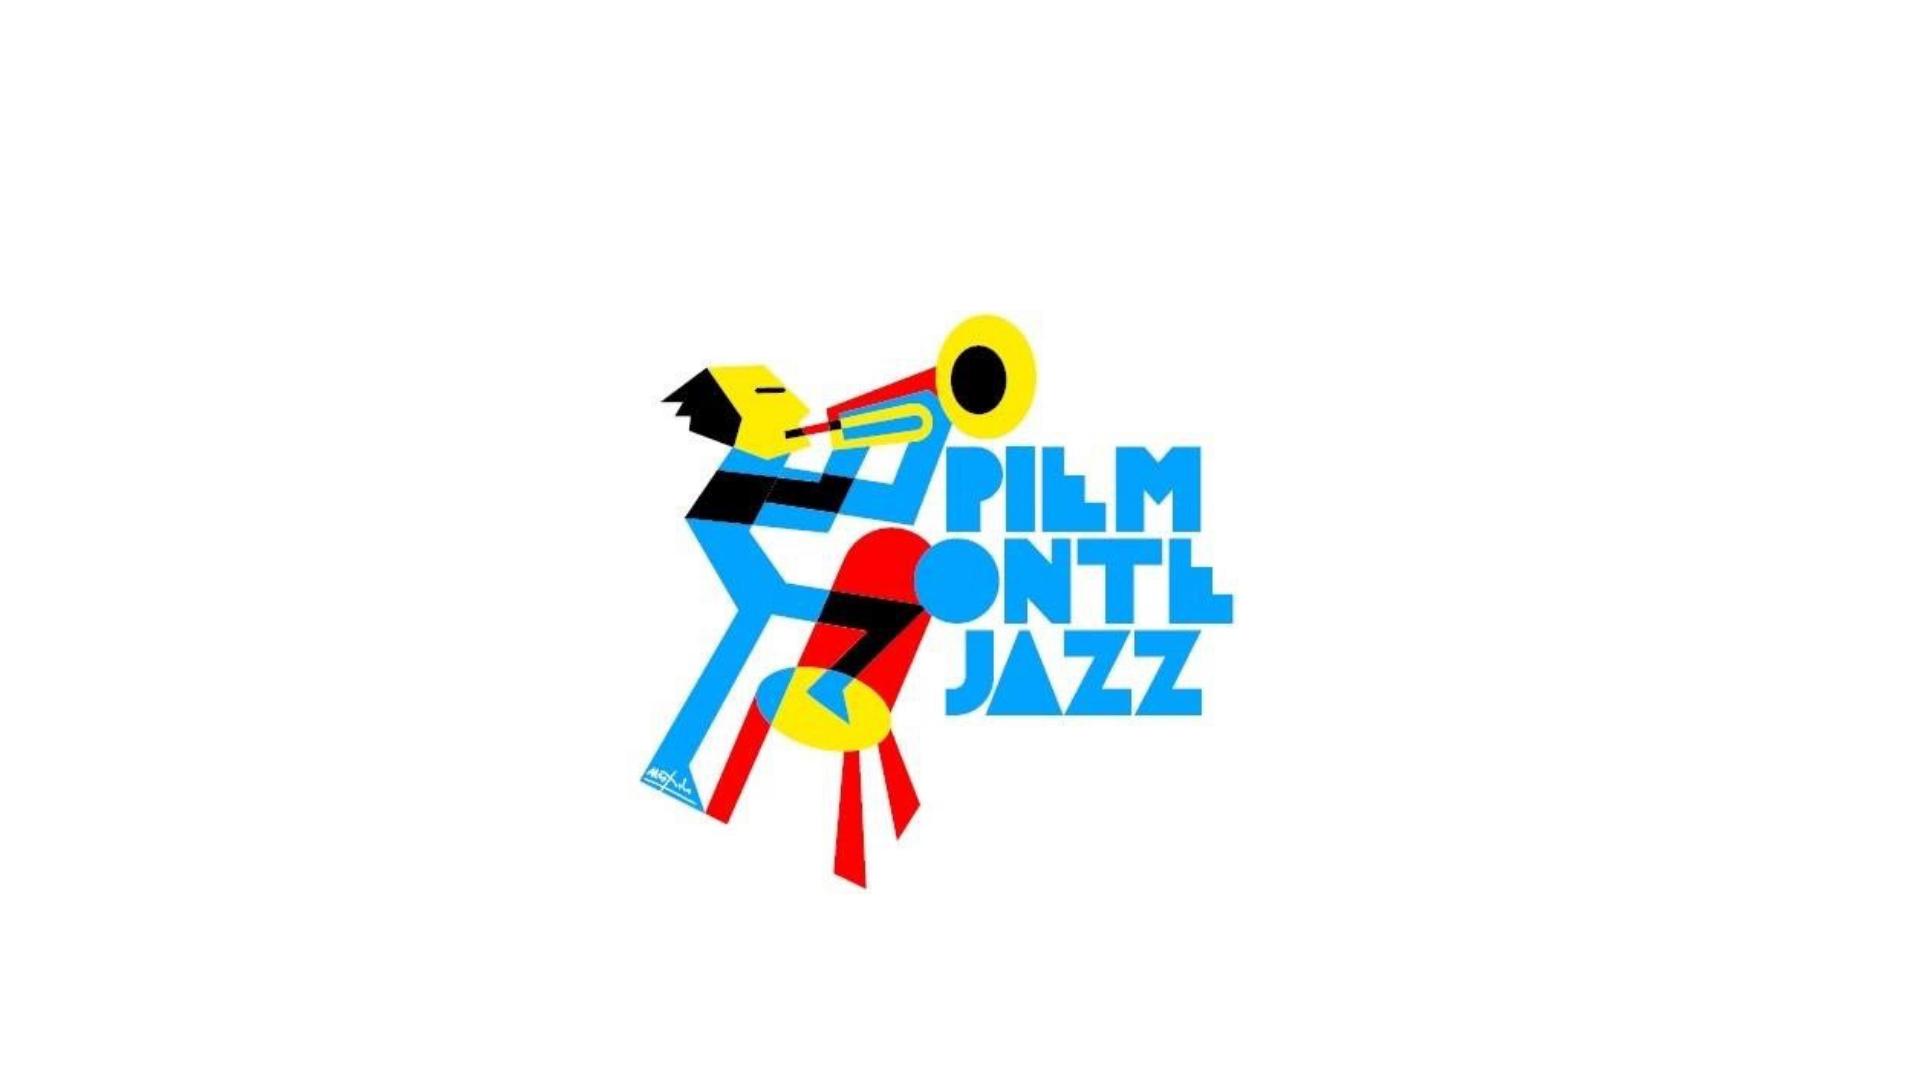 logo-consorzio-piemonte-jazz